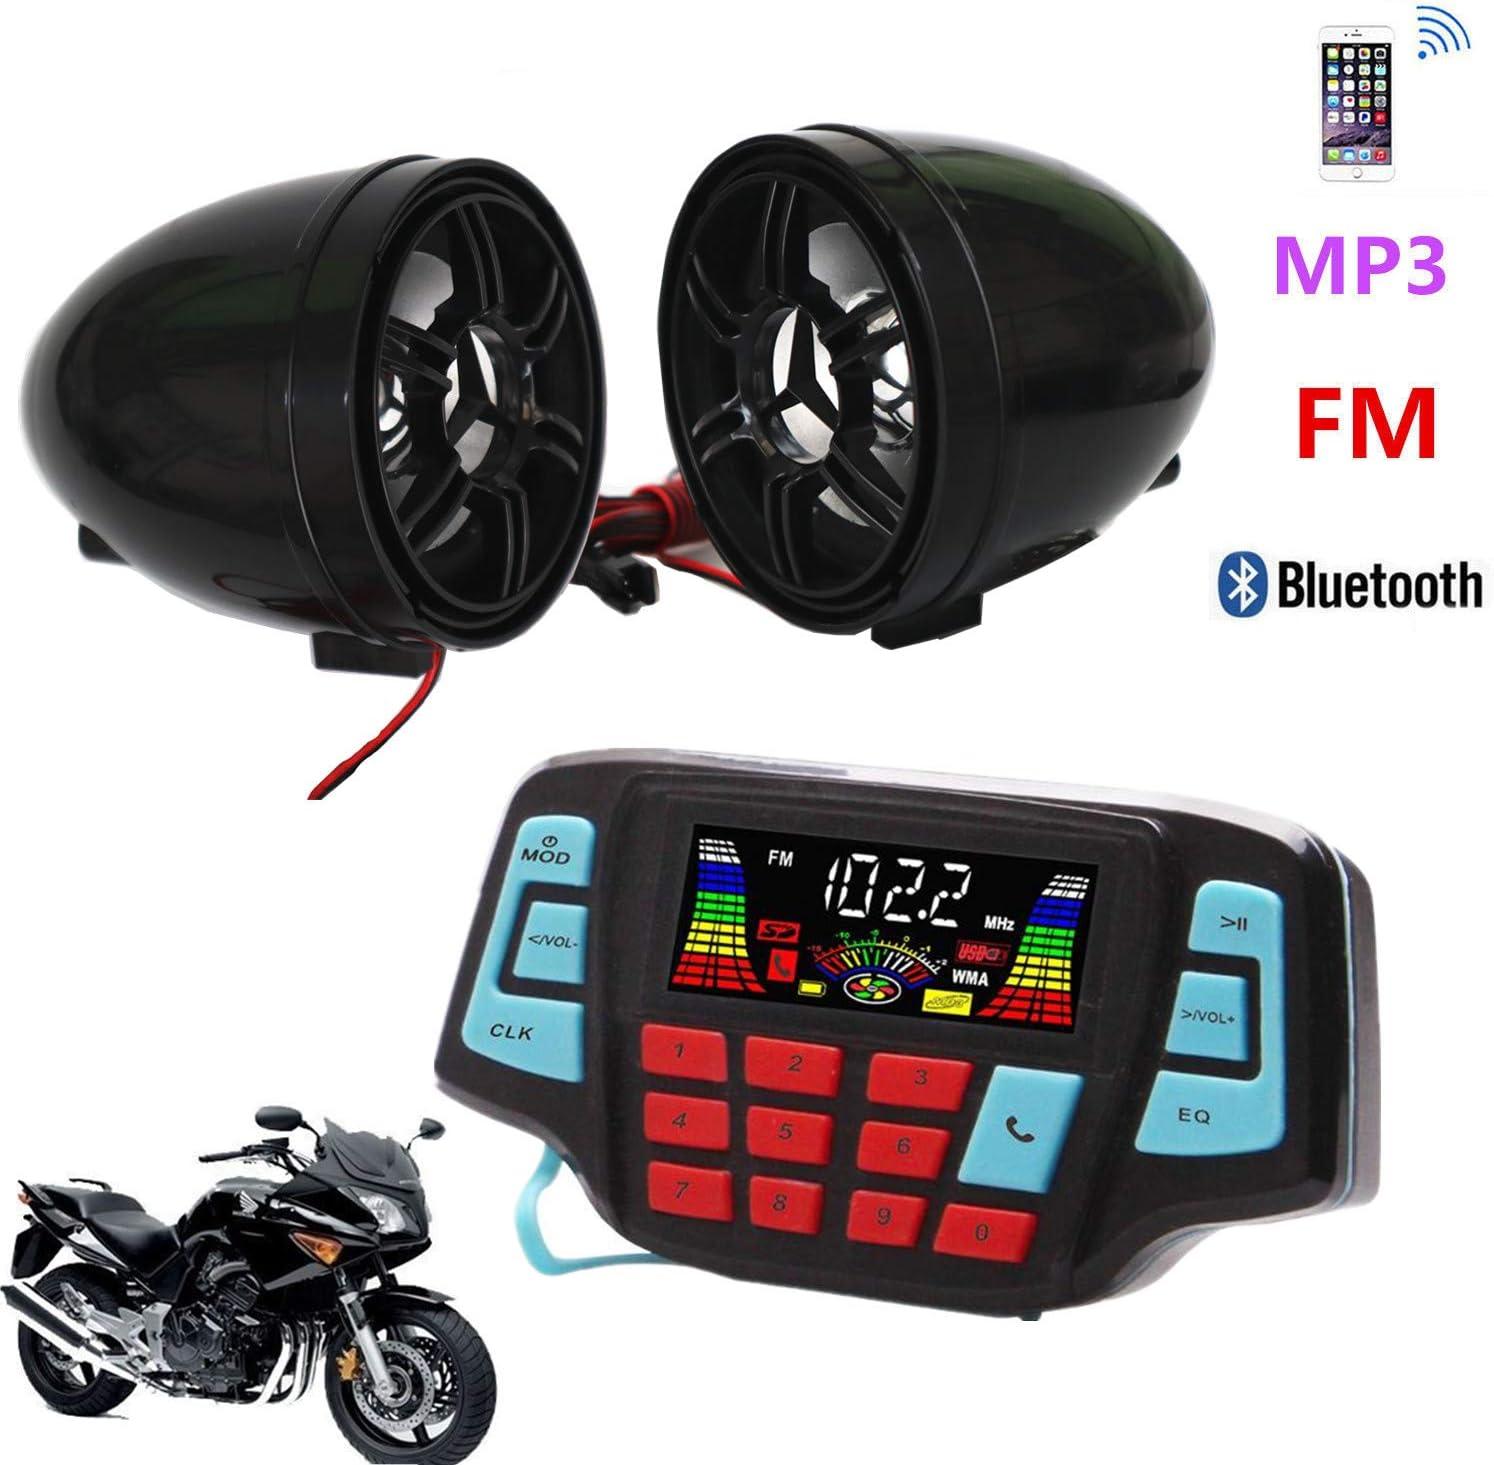 Bluetooth Motorcycle Audio Stereo Speaker System LED MP3 FM Radio USB AUX Harley